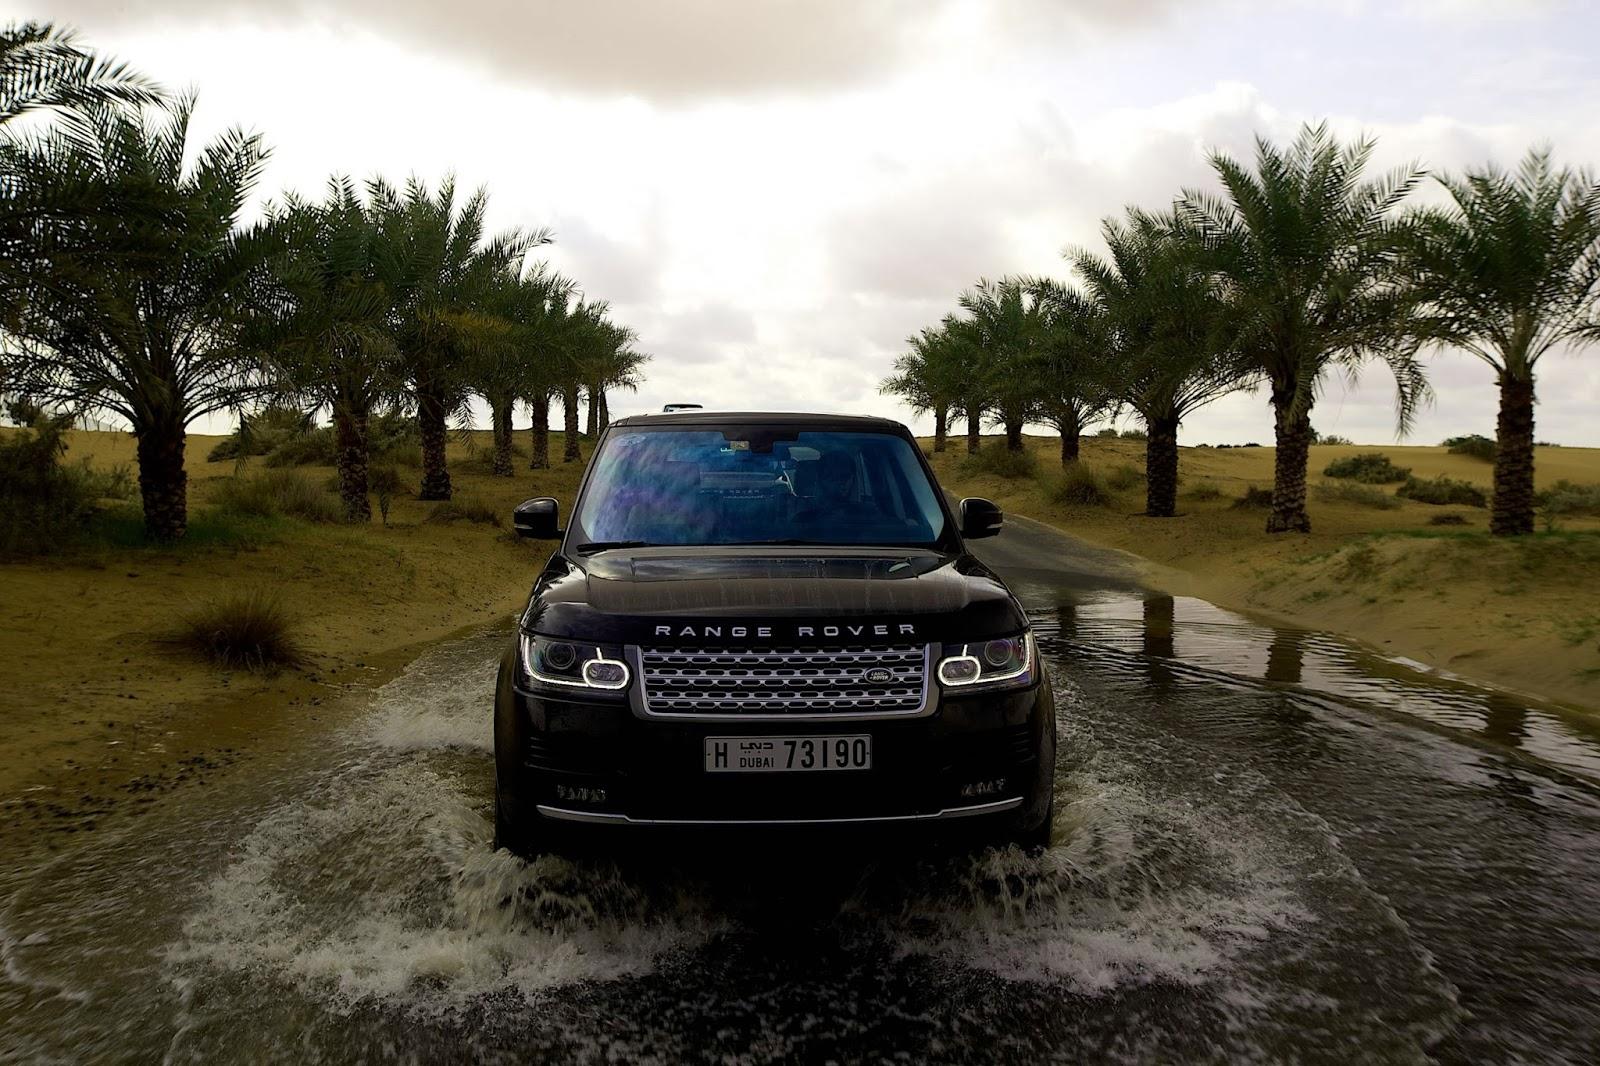 27 Range Rover Vogue Wallpapers On Wallpapersafari